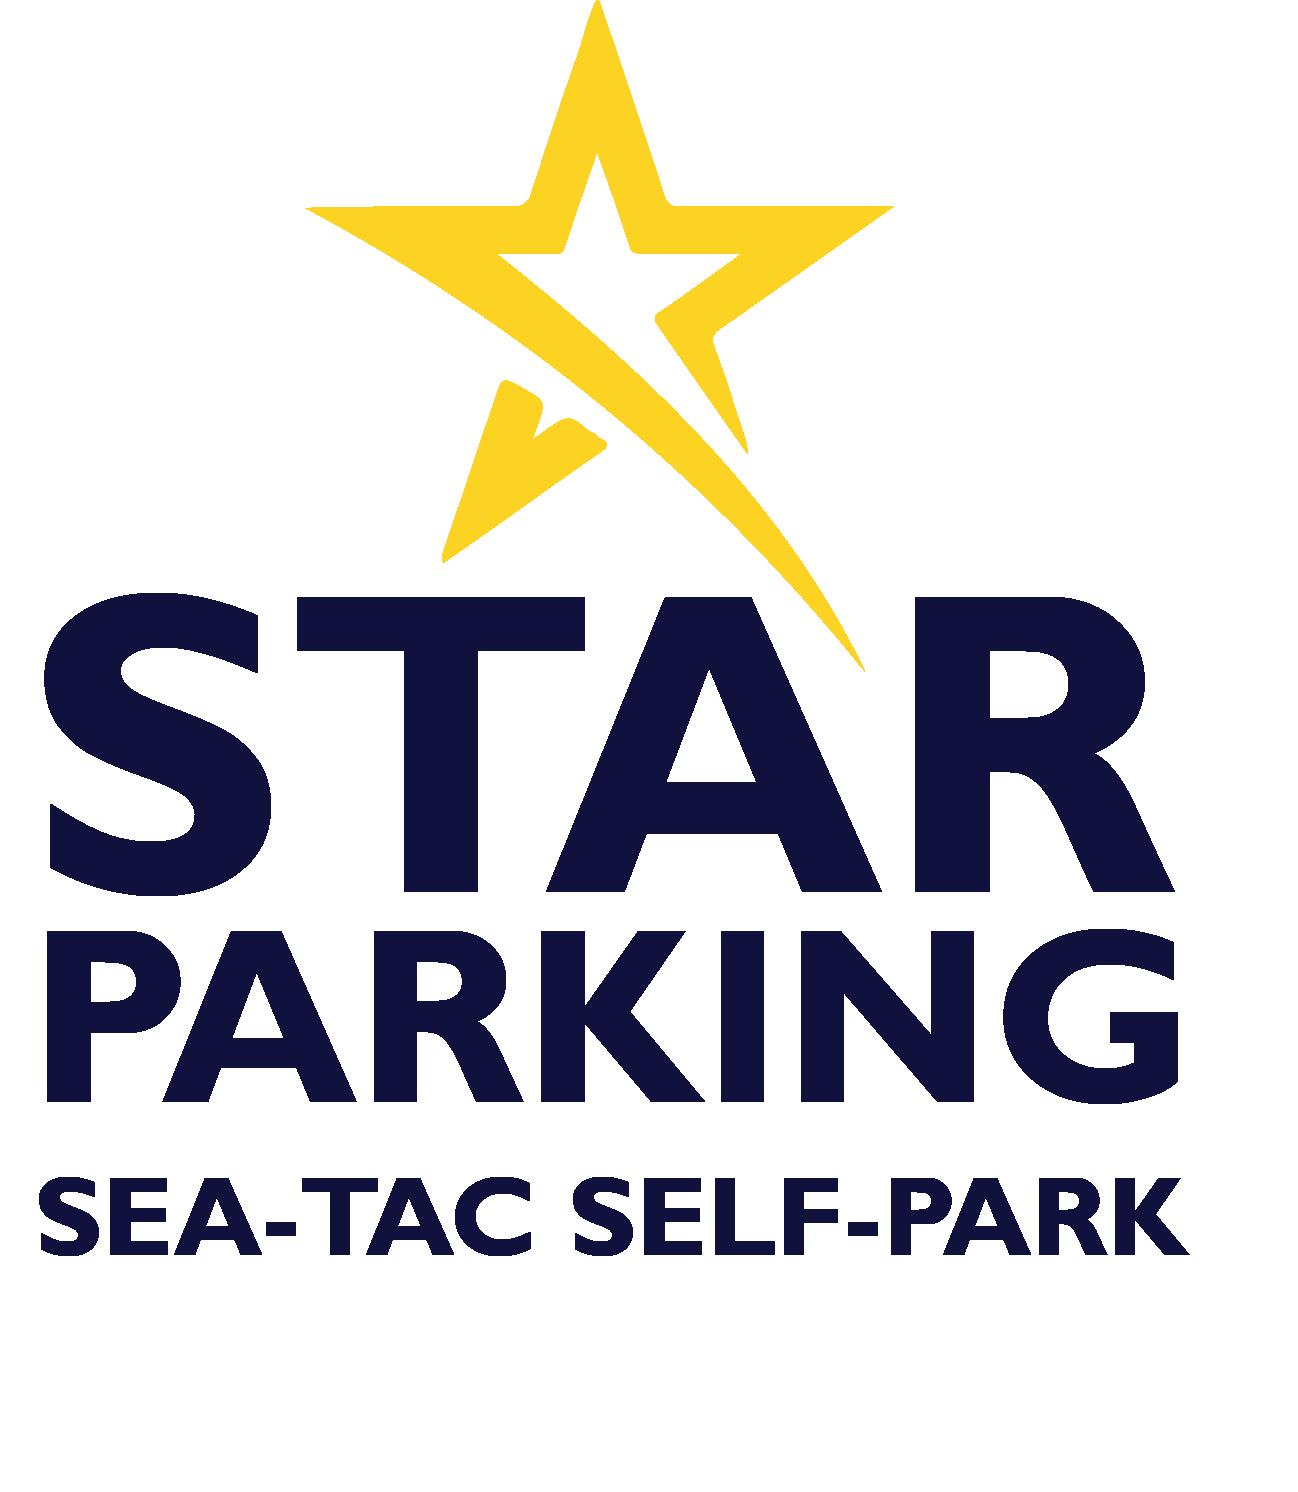 Star Parking Sea-Tac Airport Parking